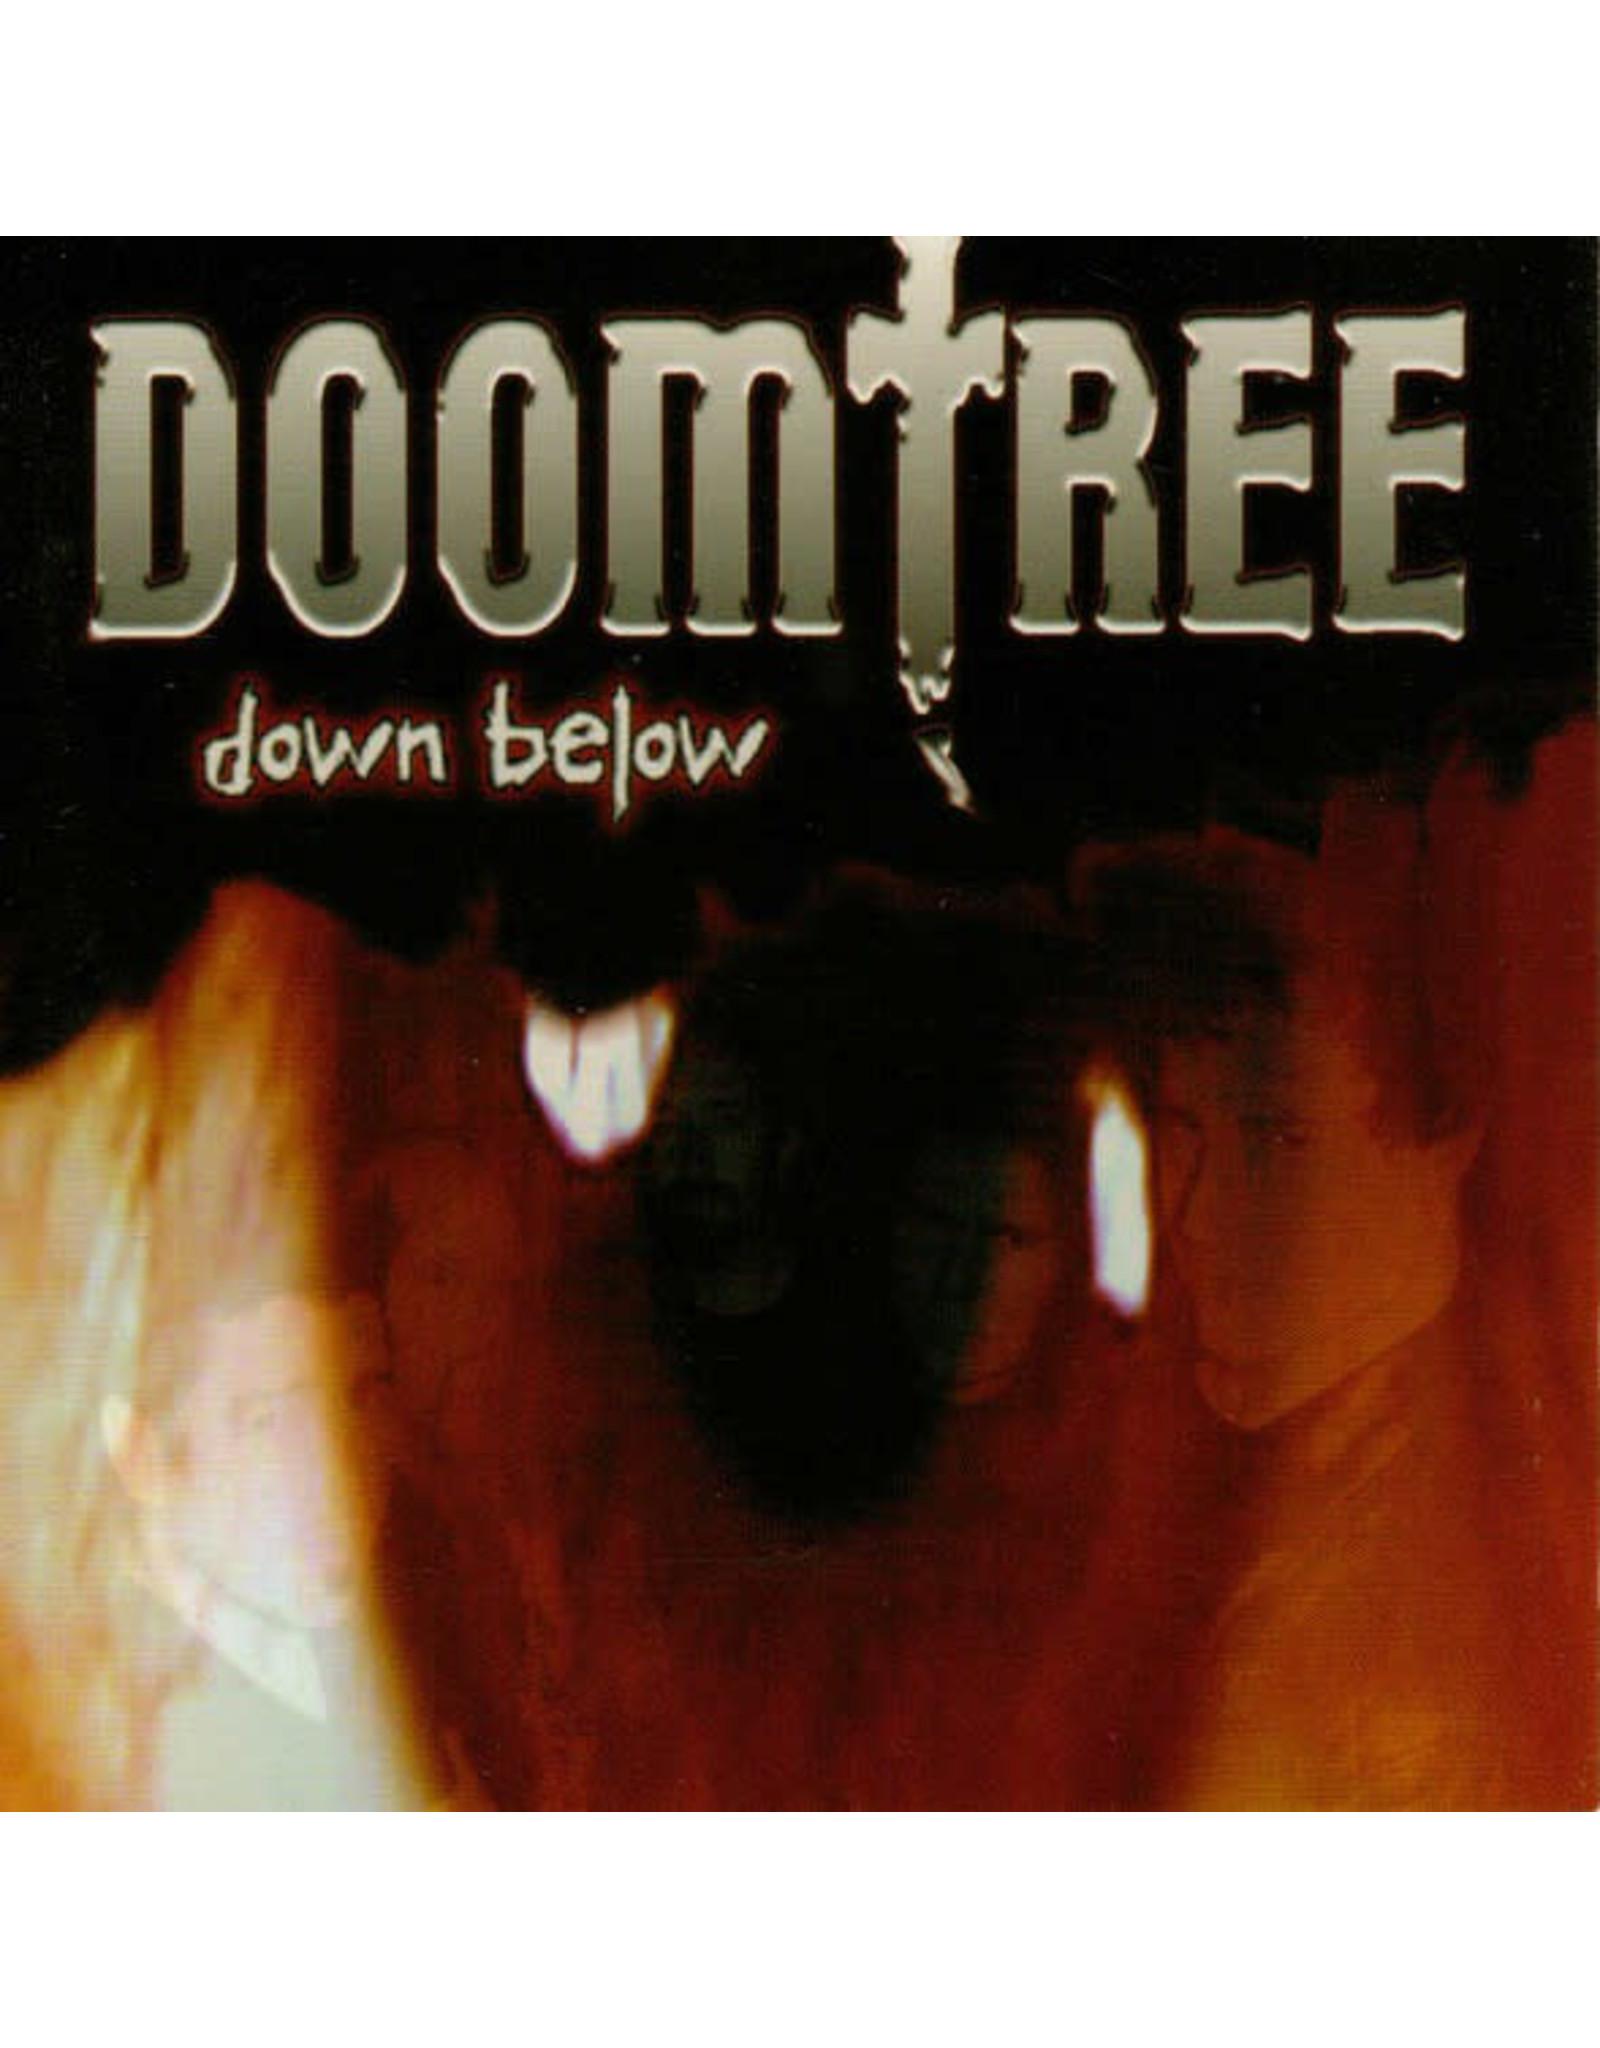 Doomtree - Down Below CD